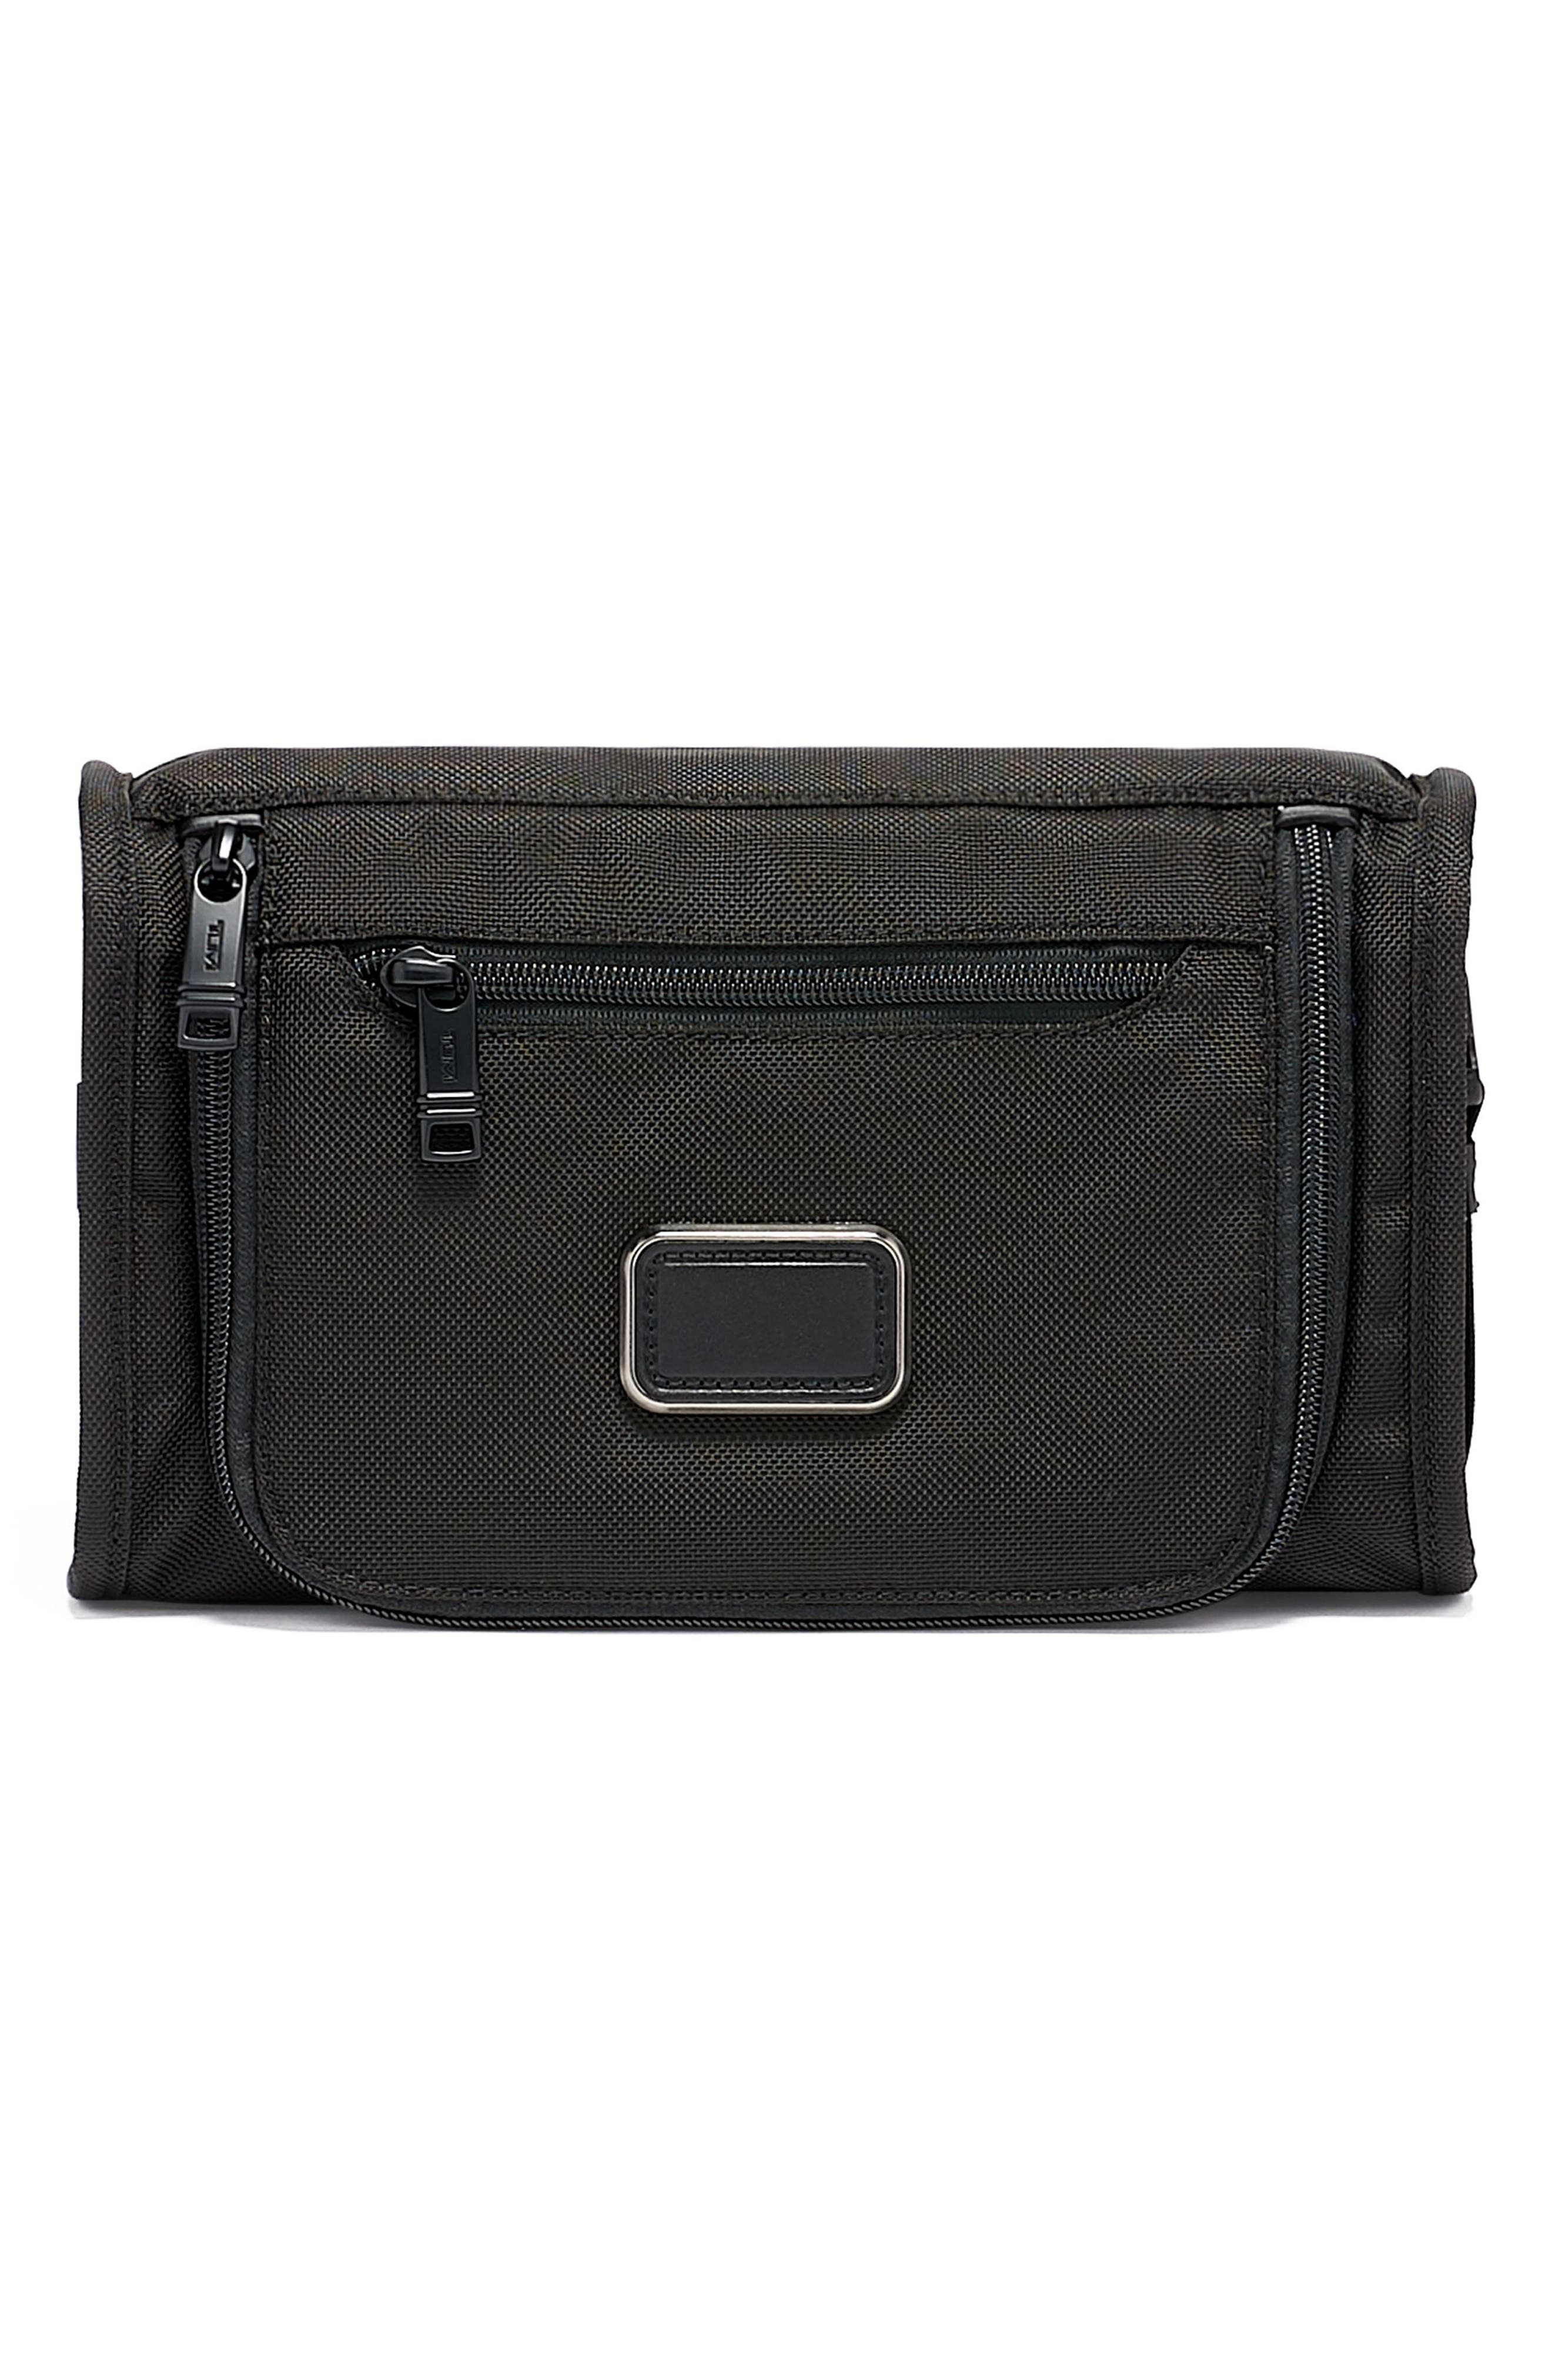 Alpha 3 Travel Kit